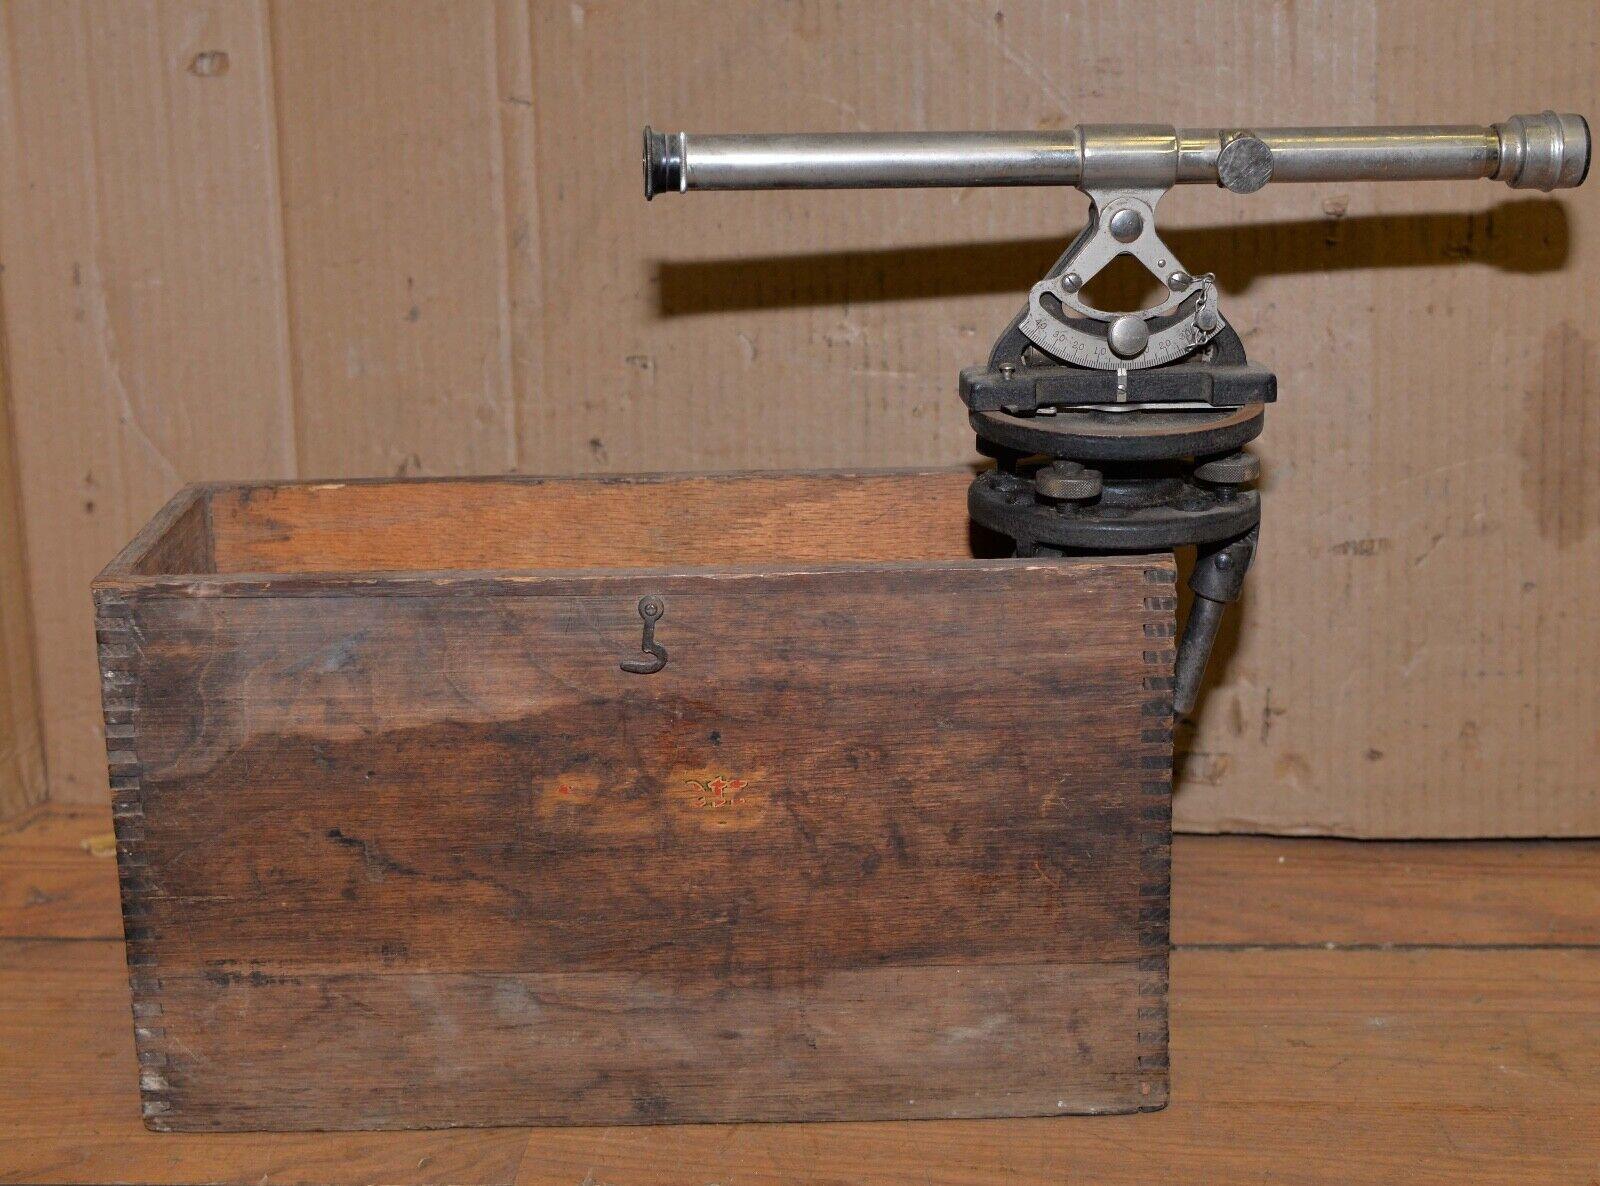 Antique Starrett transit lens original wood box collectible surveyors tool